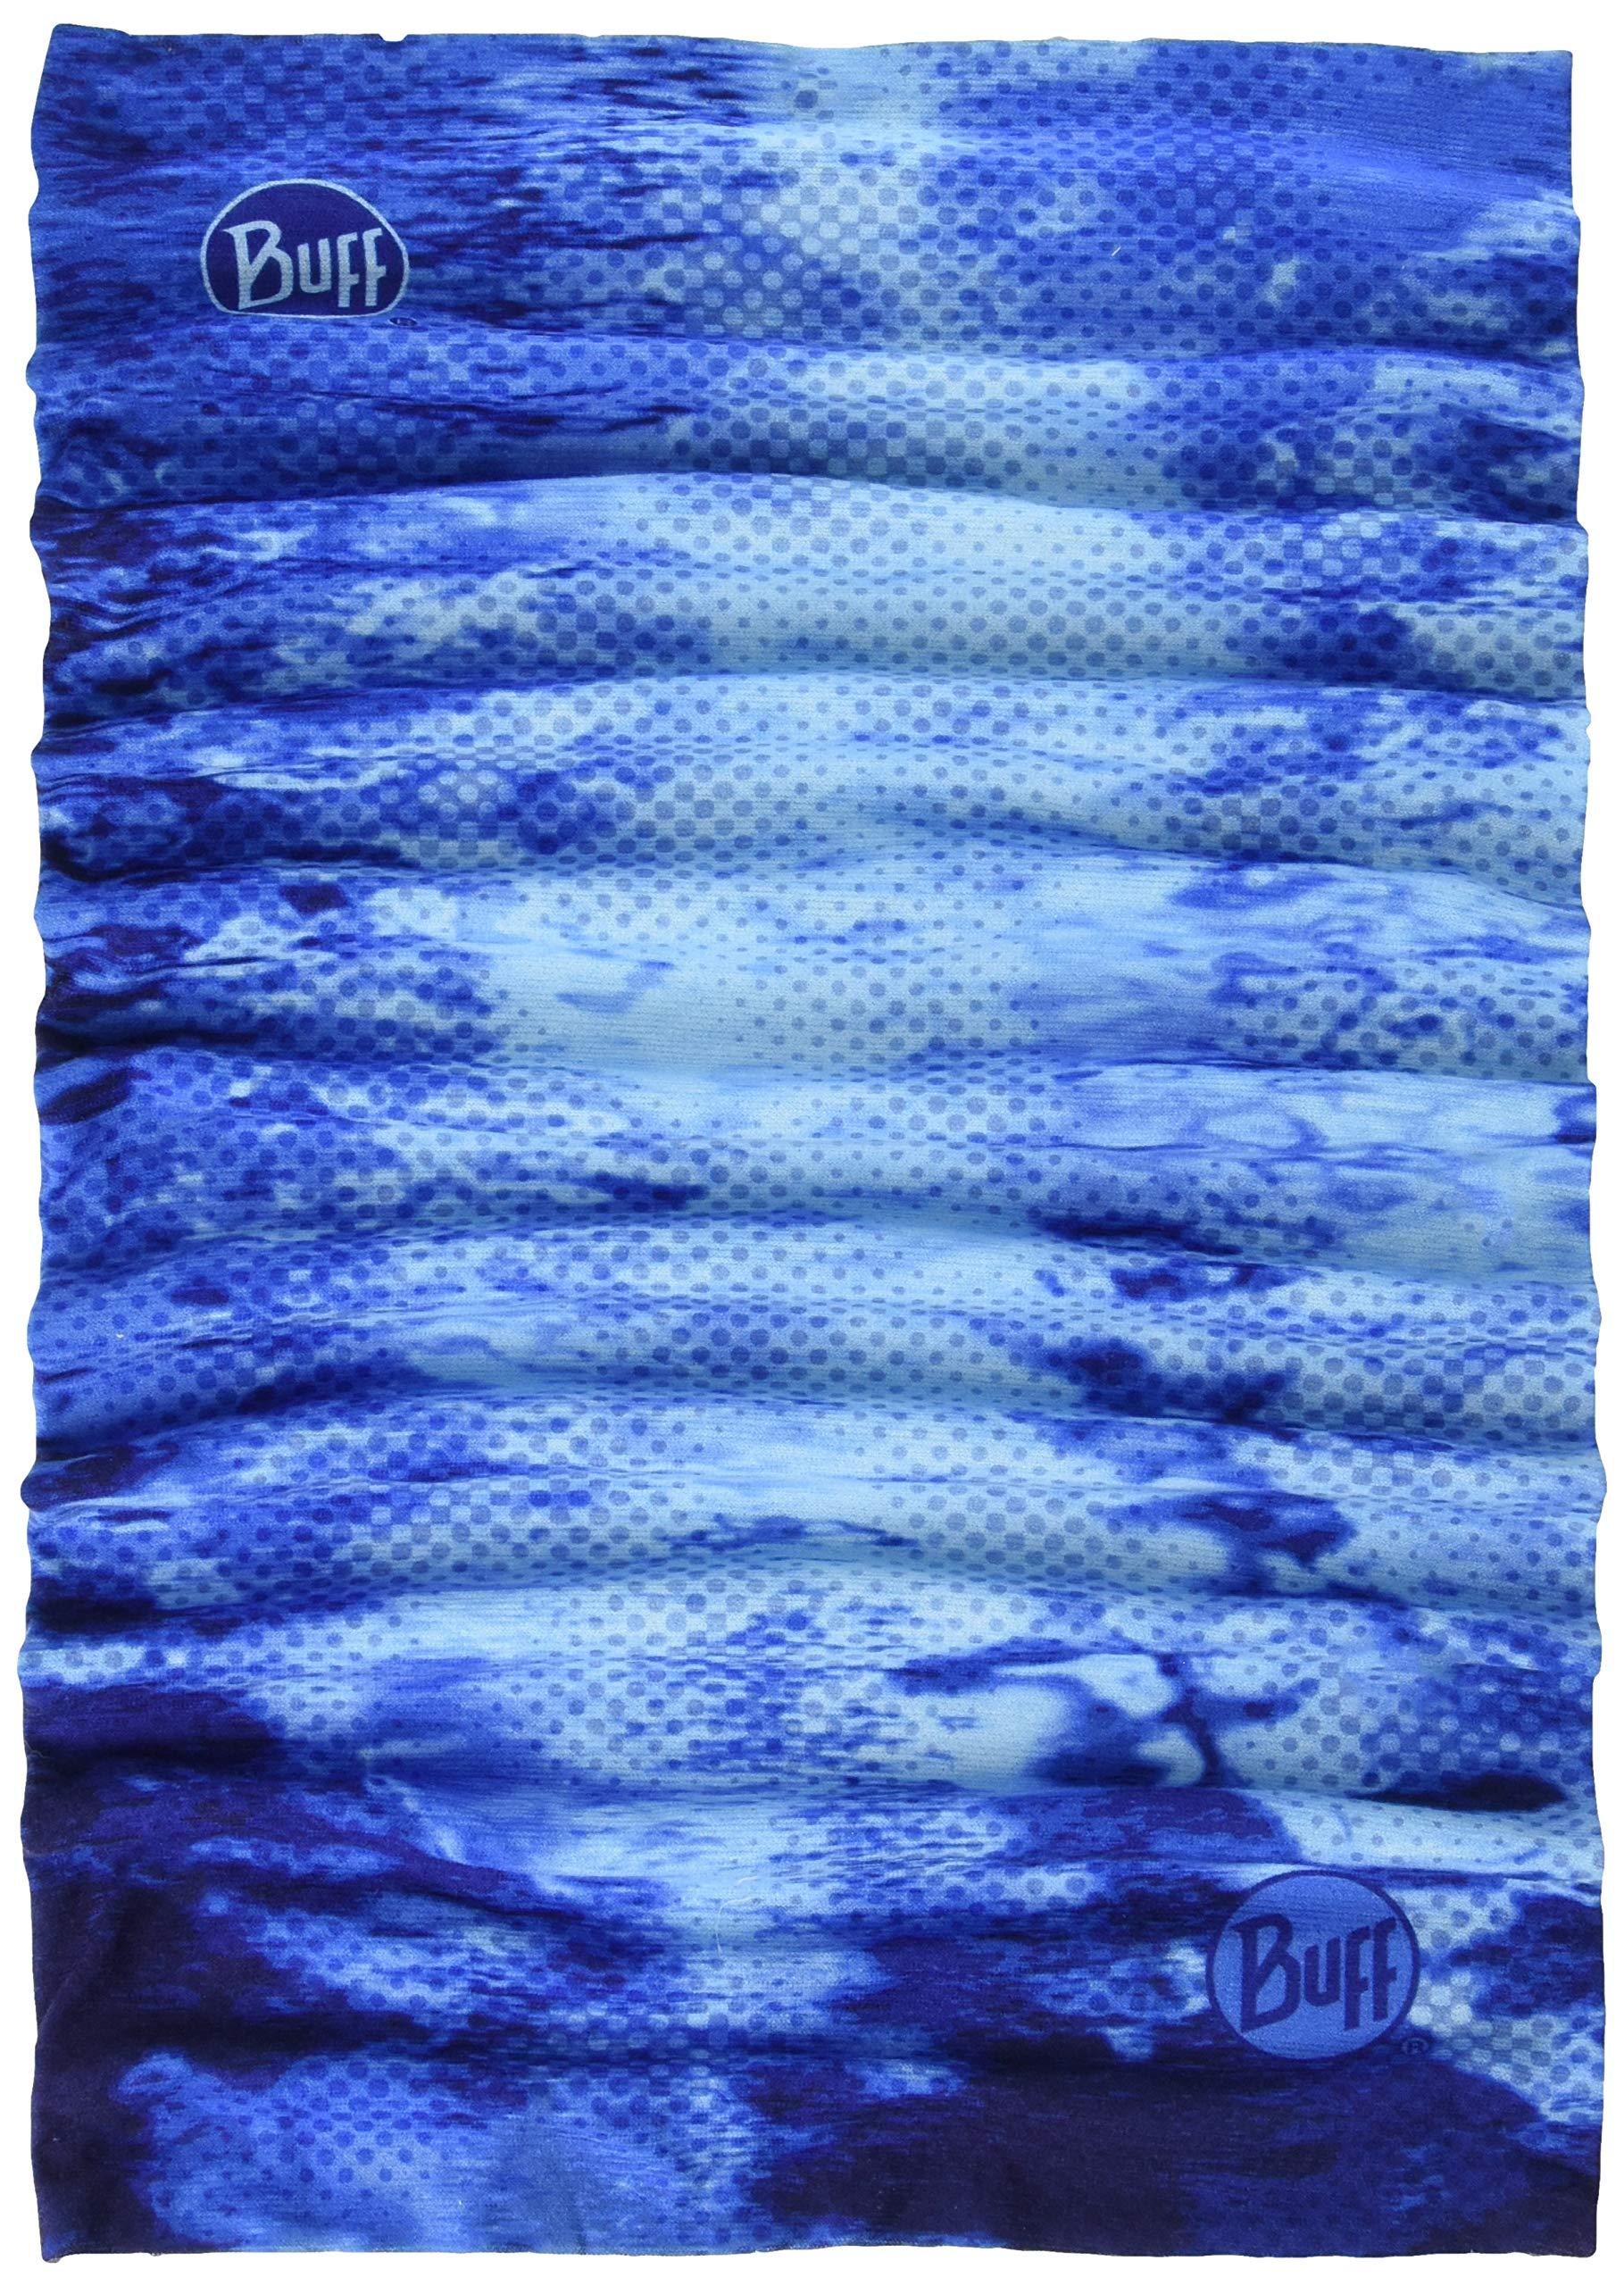 BUFF Unisex Coolnet UV+ Insect Shield Pelagic Camo Blue, X-Large